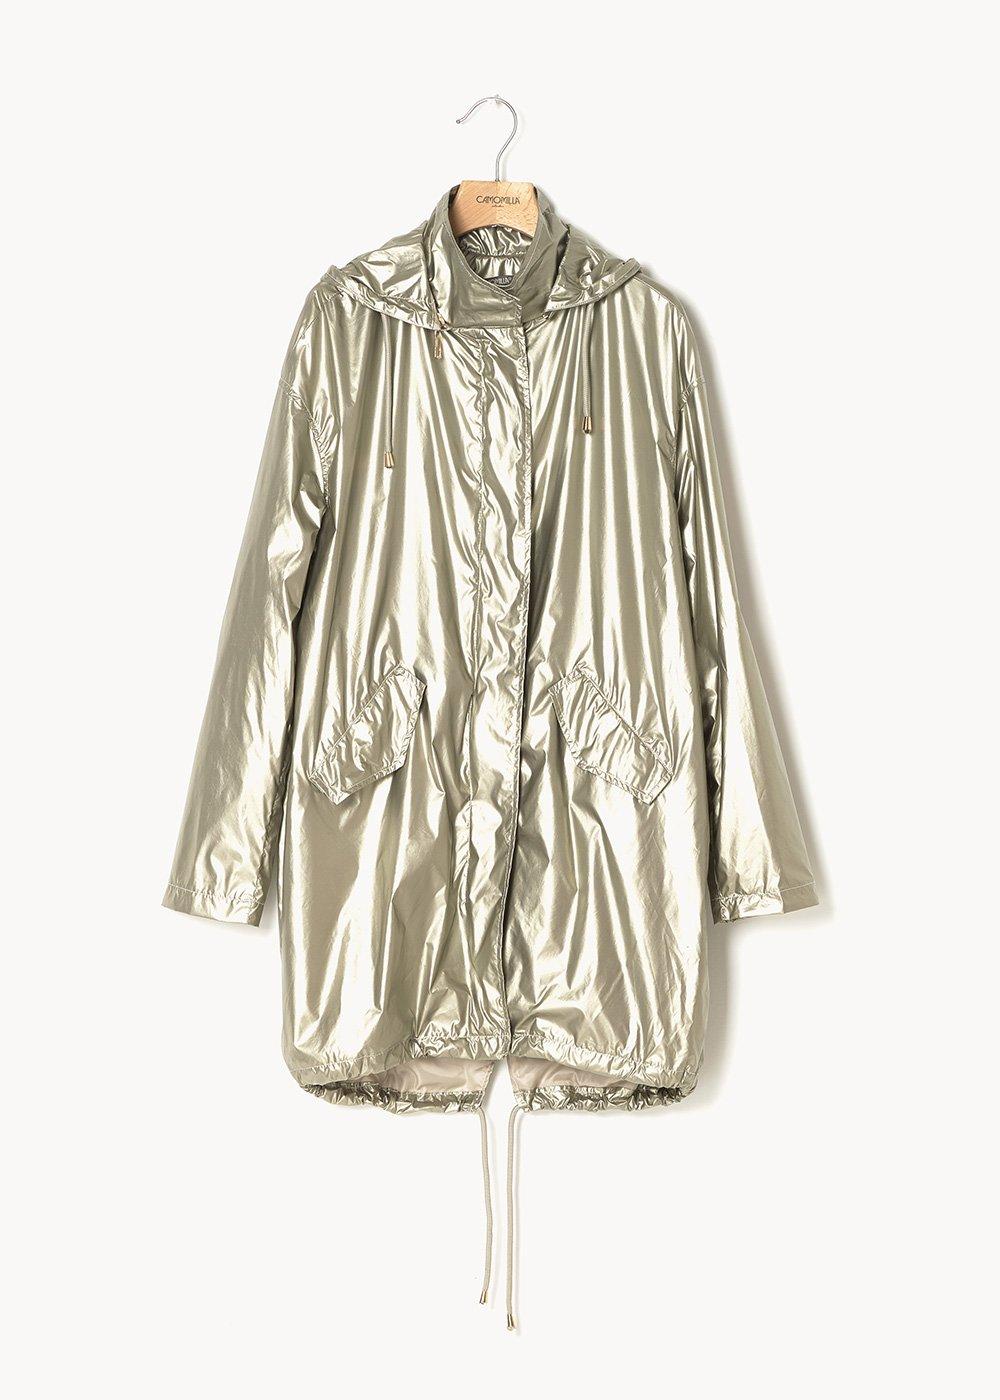 Giubbino Georgie lungo in tessuto metallico - Zenzero - Donna